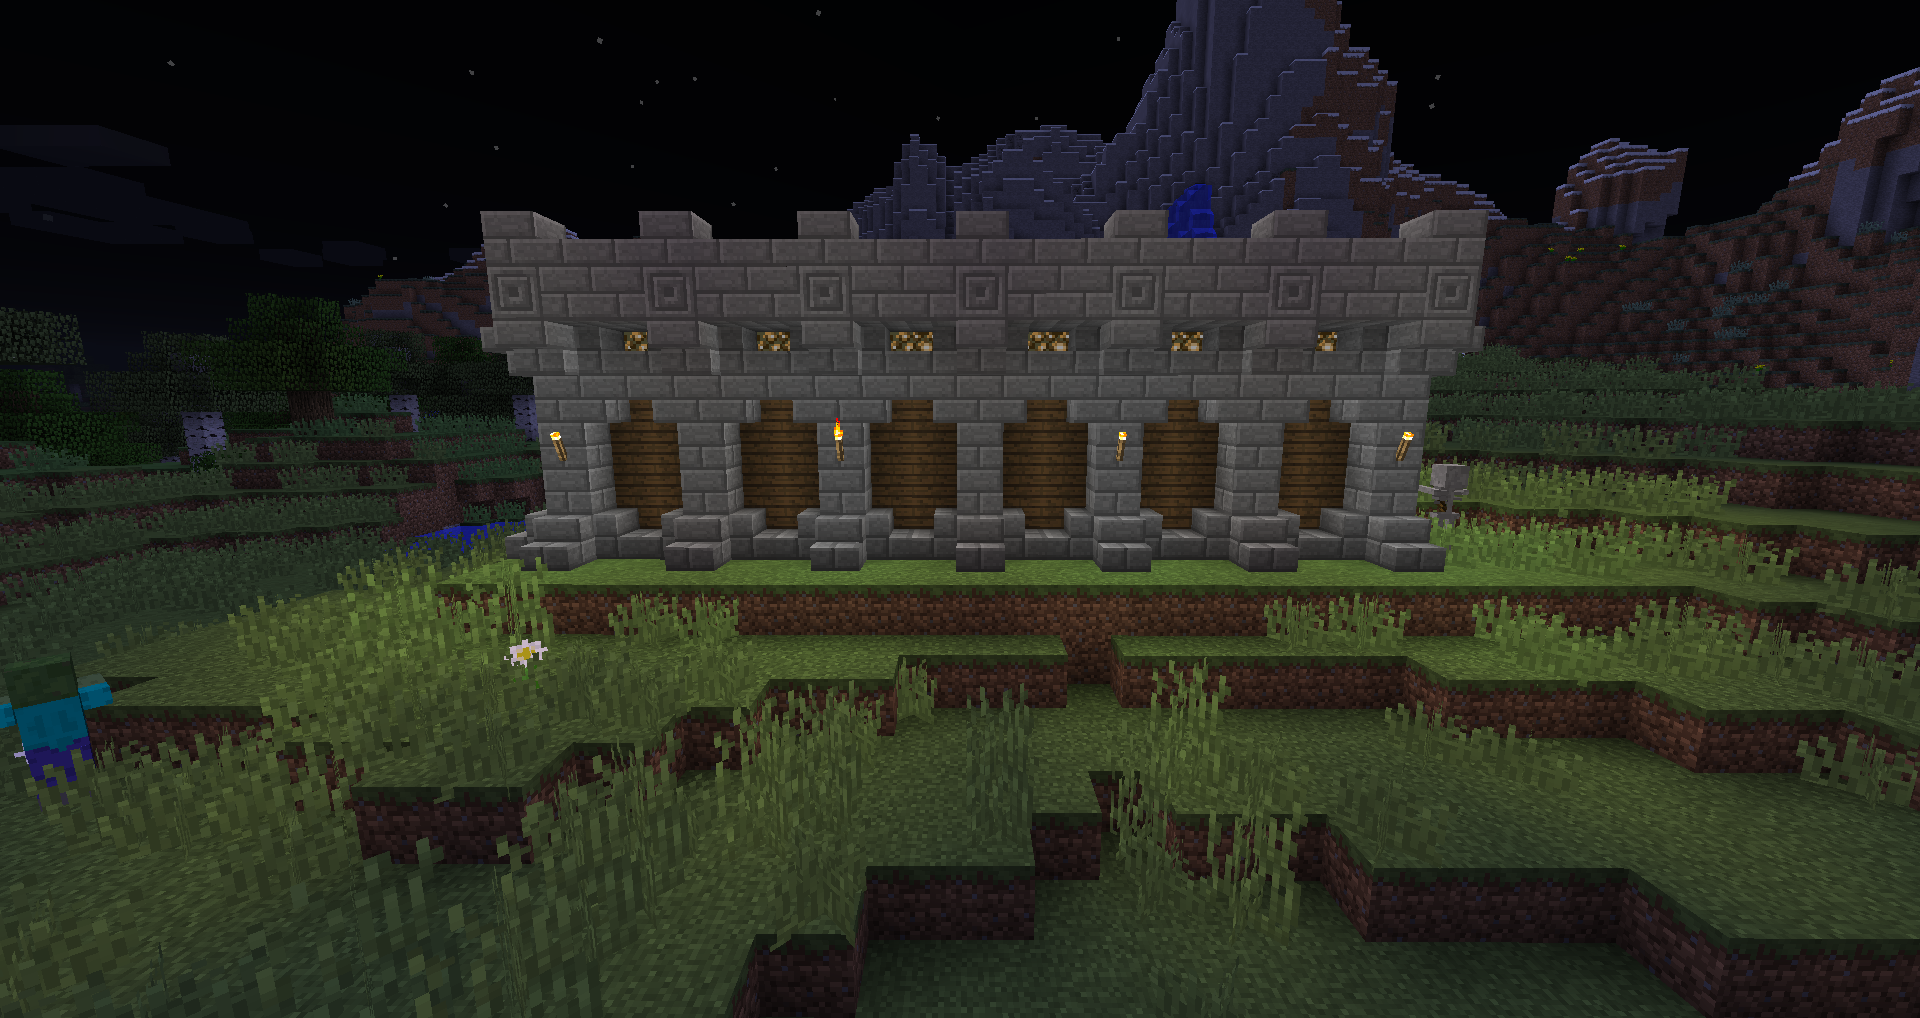 My Survival World Castle Idea Thread Mode Minecraft Java Edition Minecraft Forum